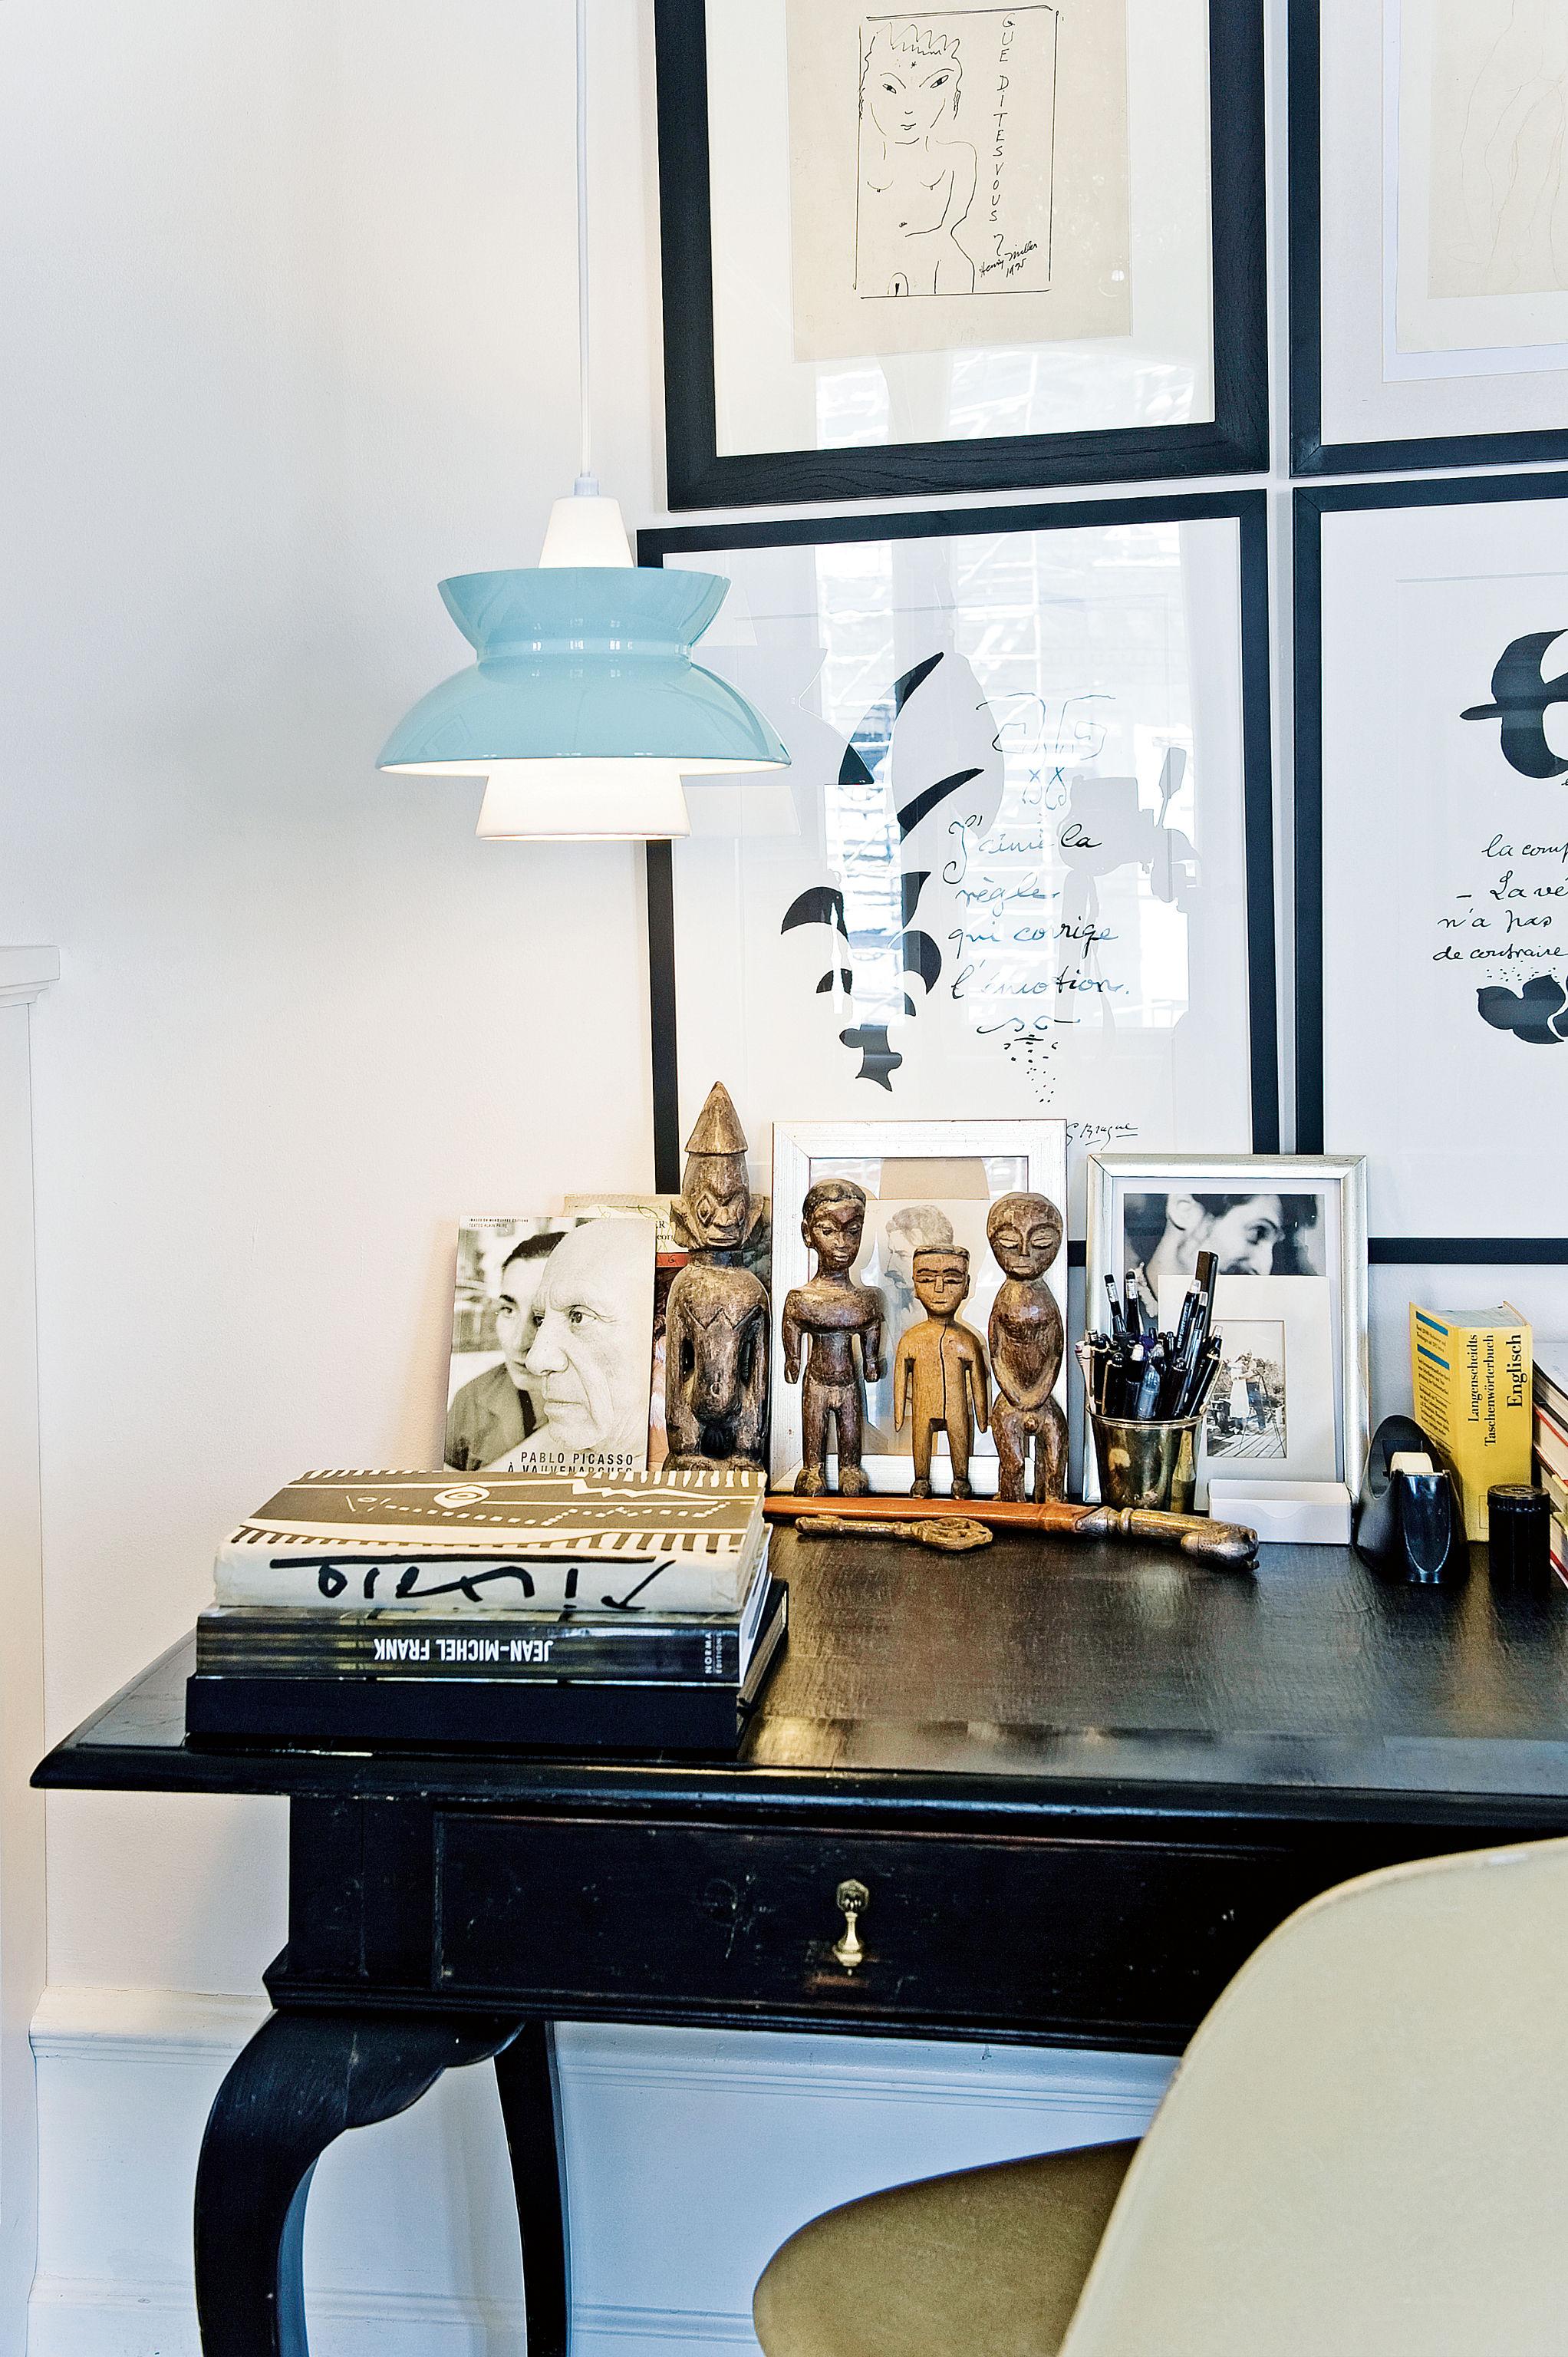 suspension doo wop bleu louis poulsen. Black Bedroom Furniture Sets. Home Design Ideas